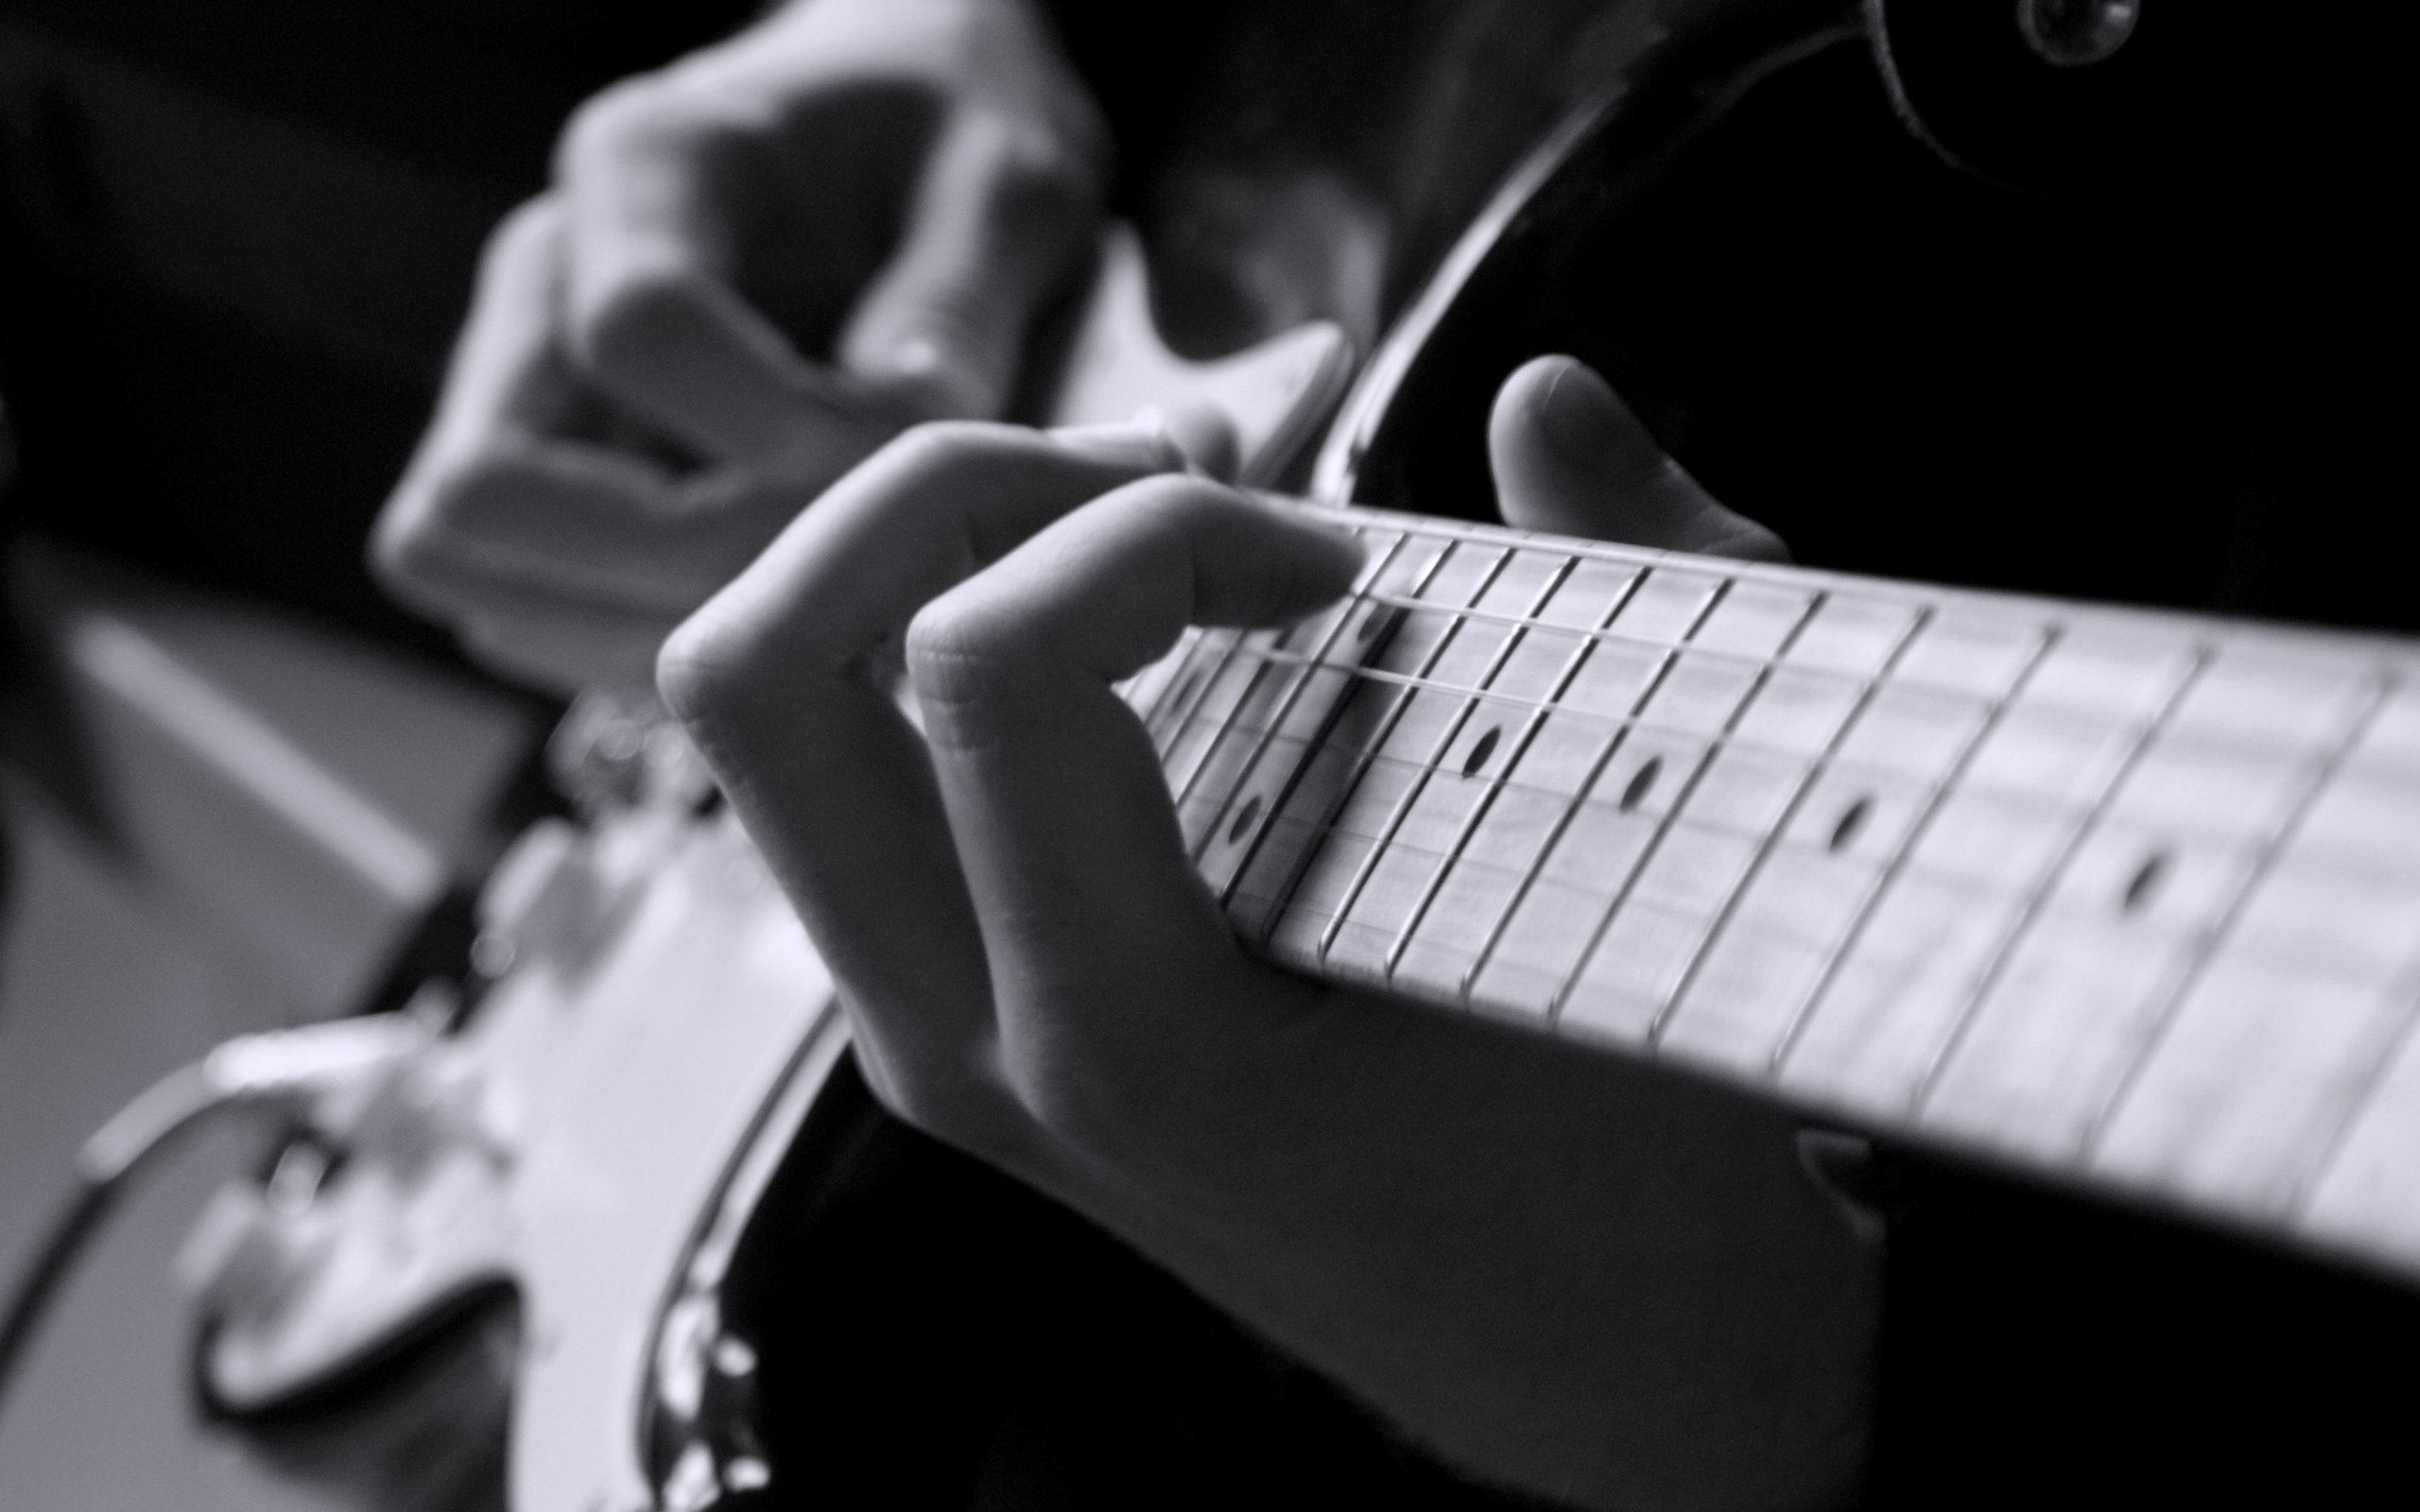 Download Hd 2560x1600 Guitar Desktop Wallpaper Id 249339 For Free